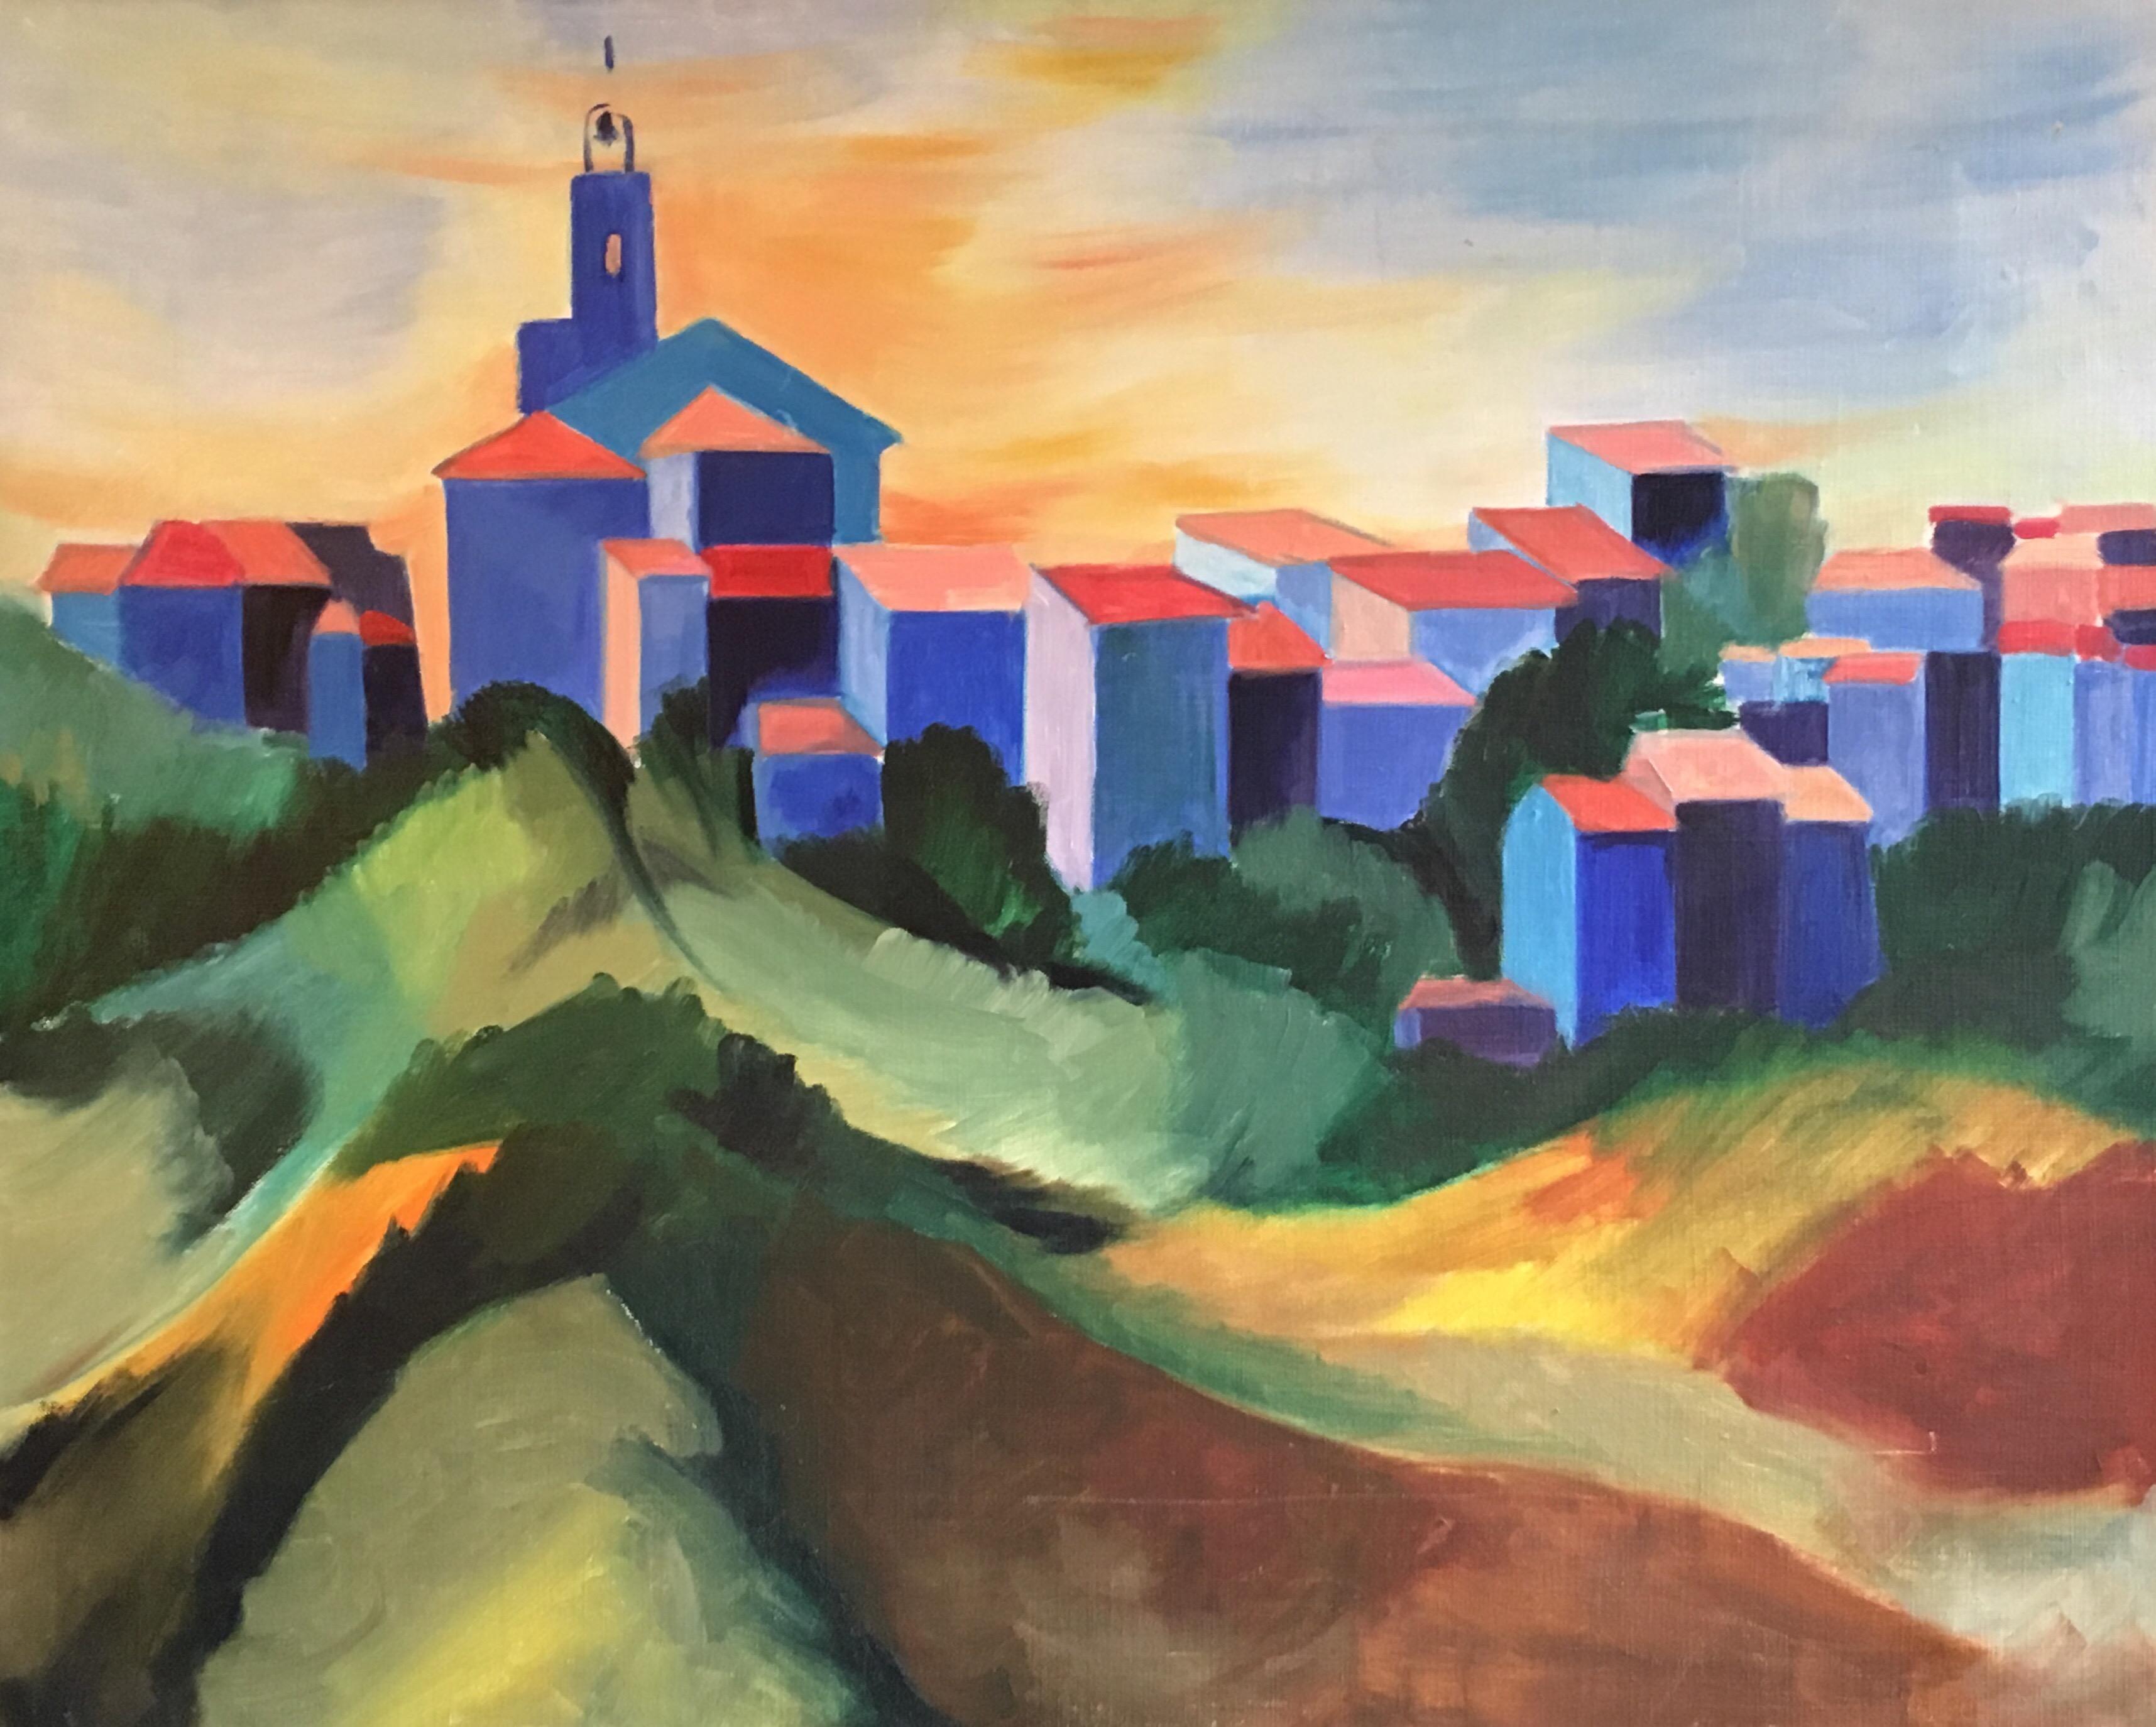 Bright Coloured Cubist Stylised Landscape, Original Oil Painting